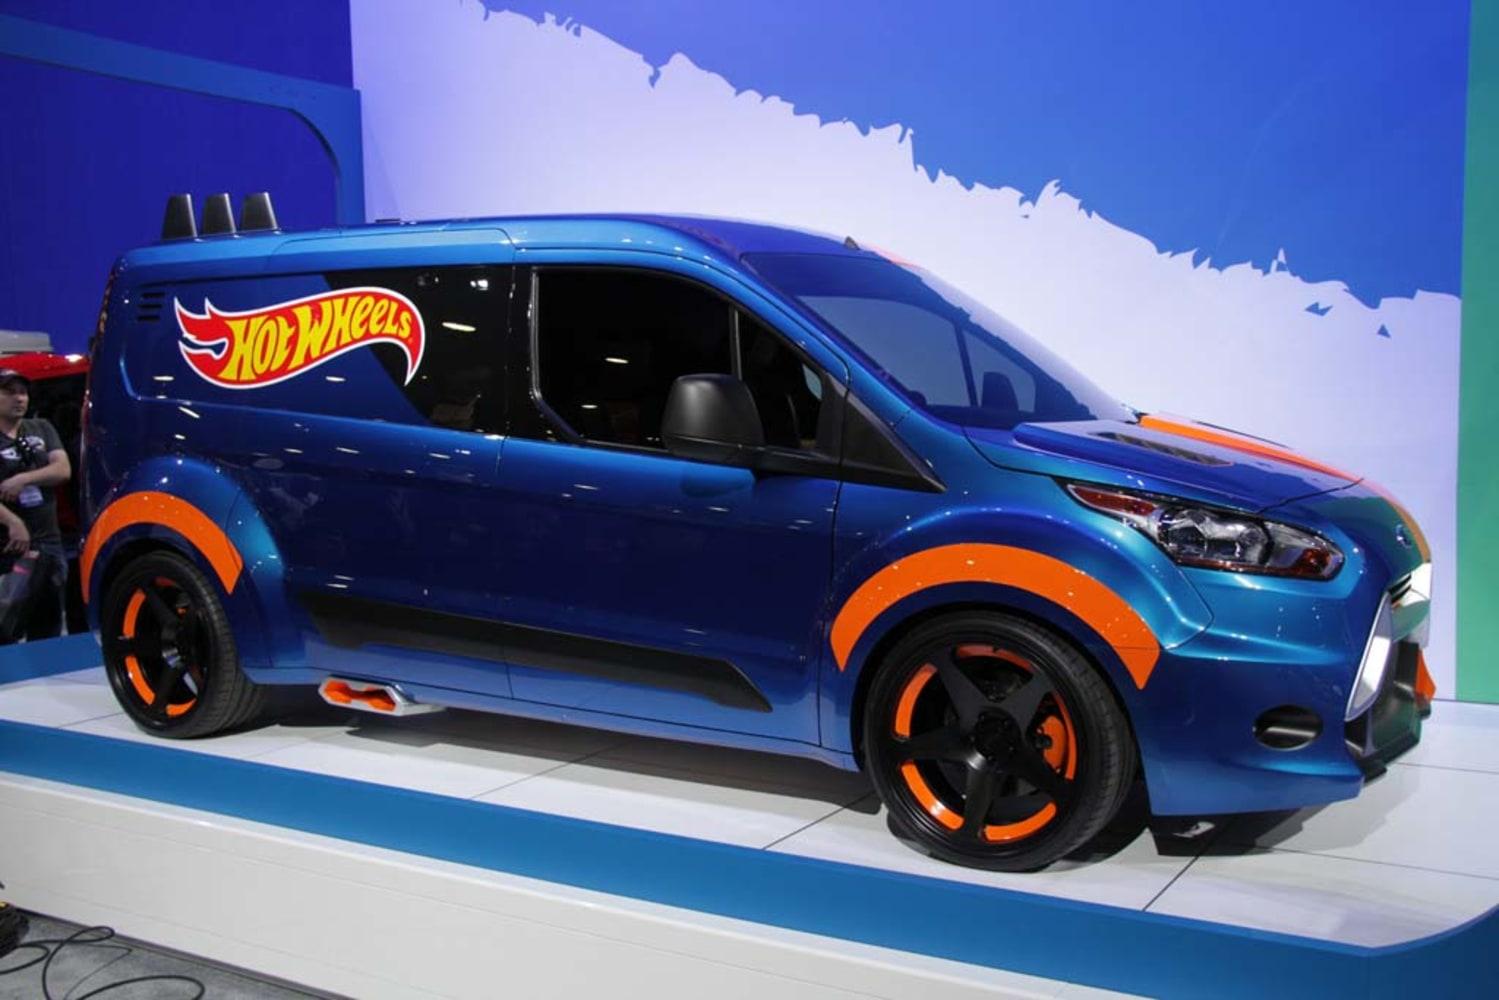 For Gen Y Car Buyers Customizing Their Ride Is Key Nbc News